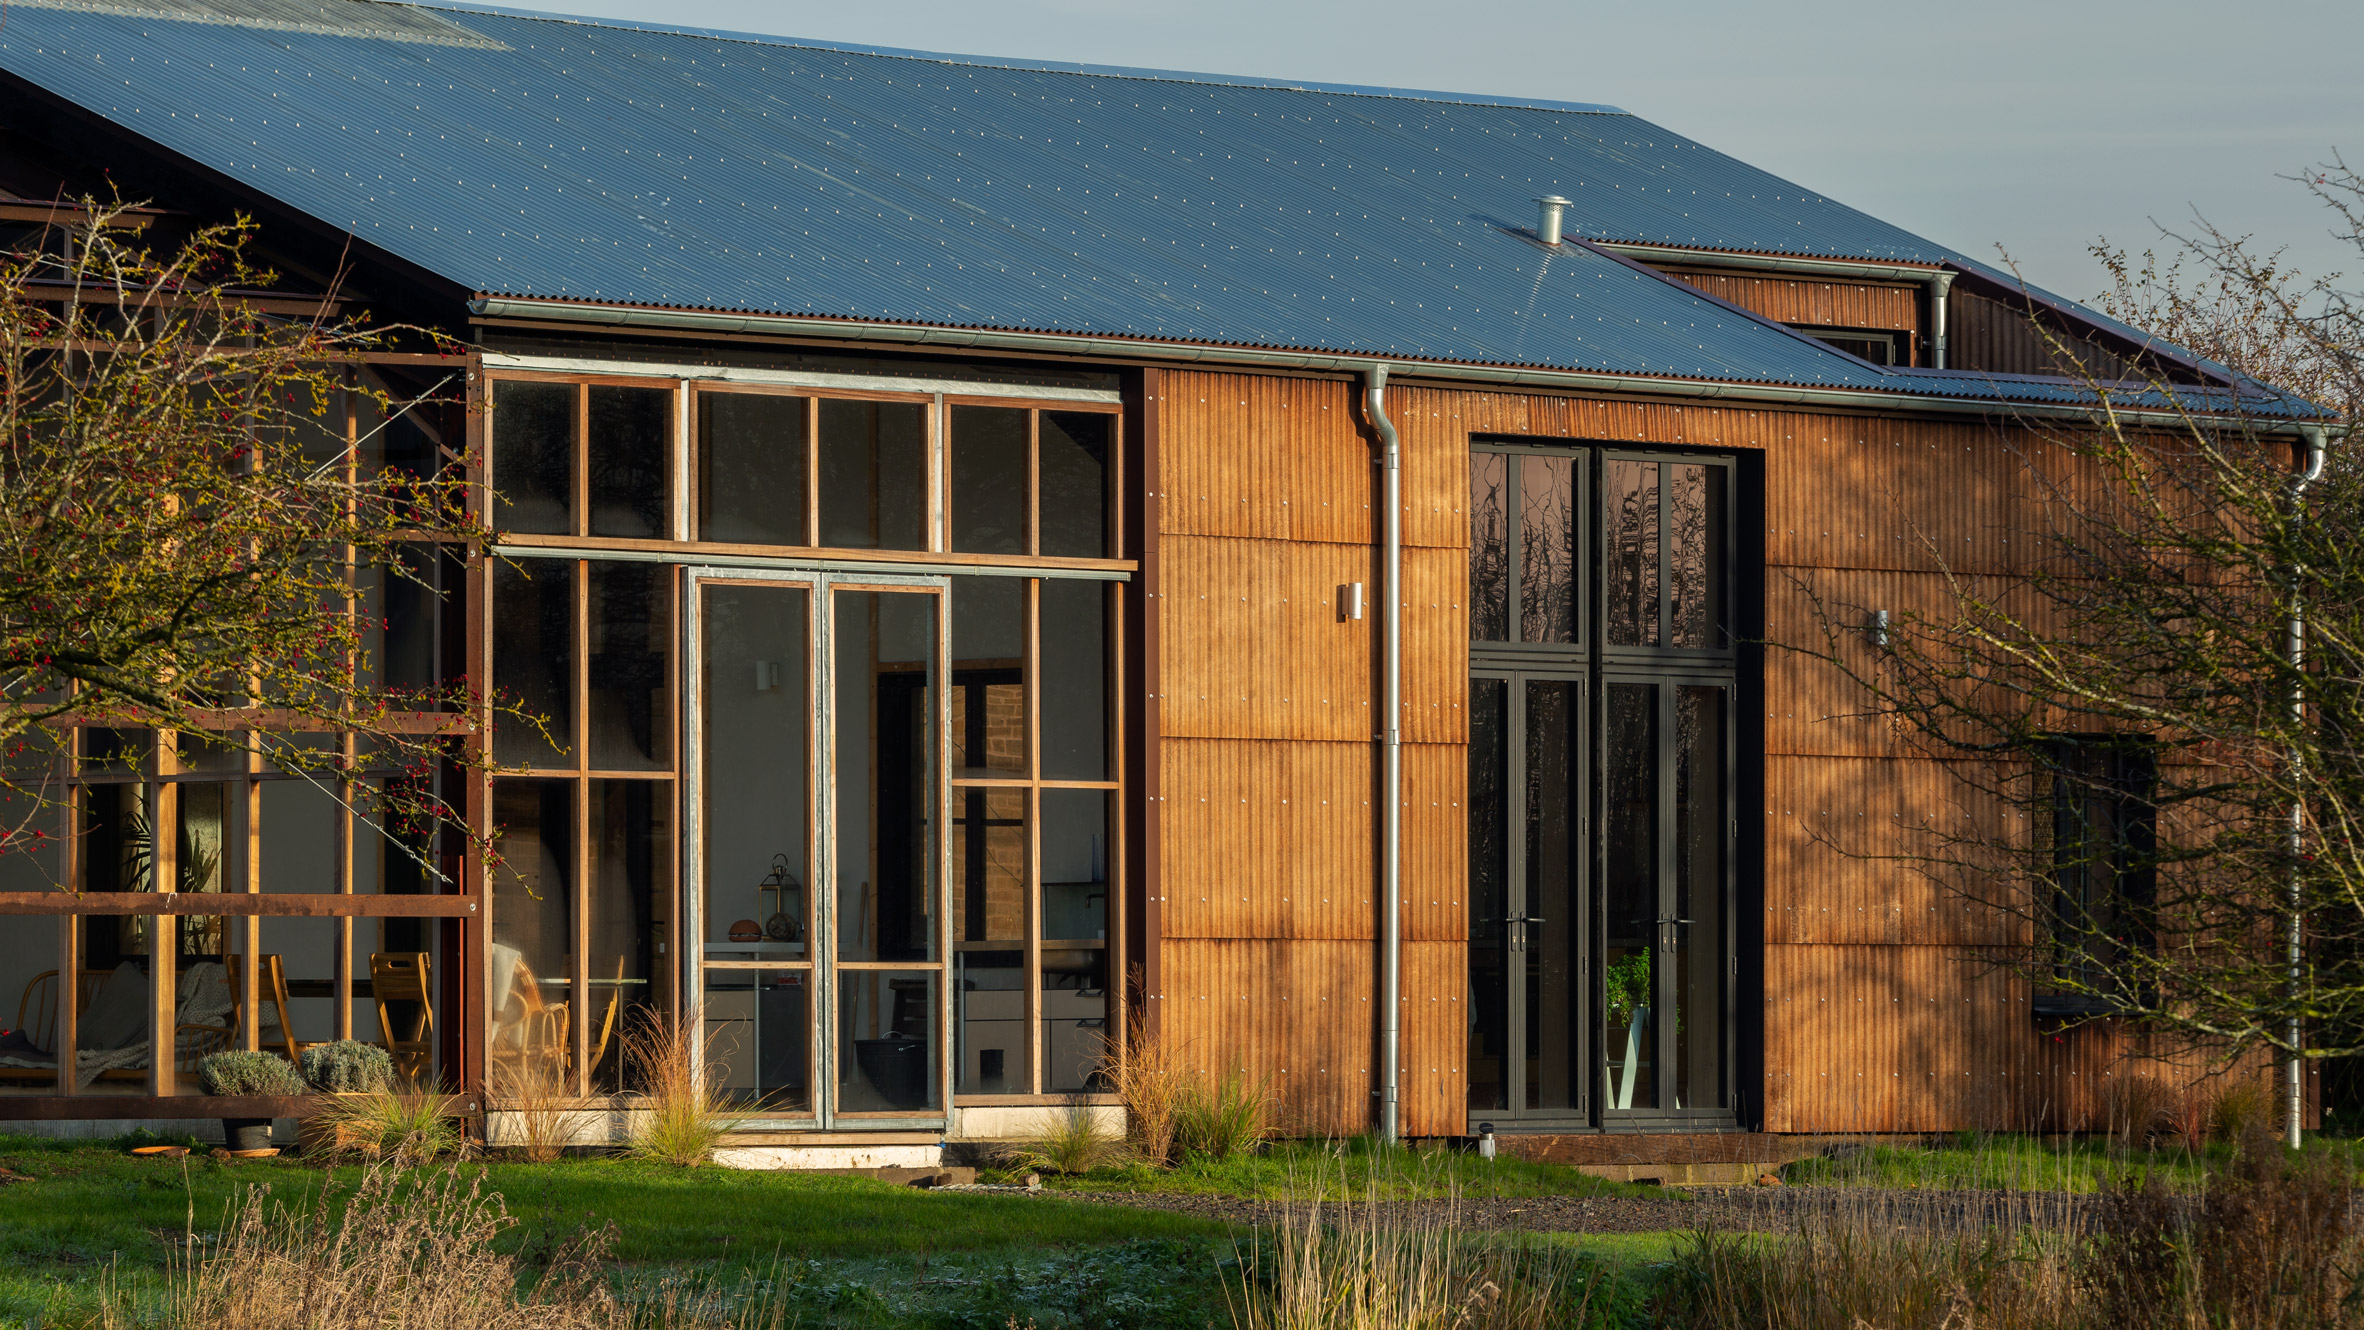 Solar-powered farmhouse makes use of hemp throughout